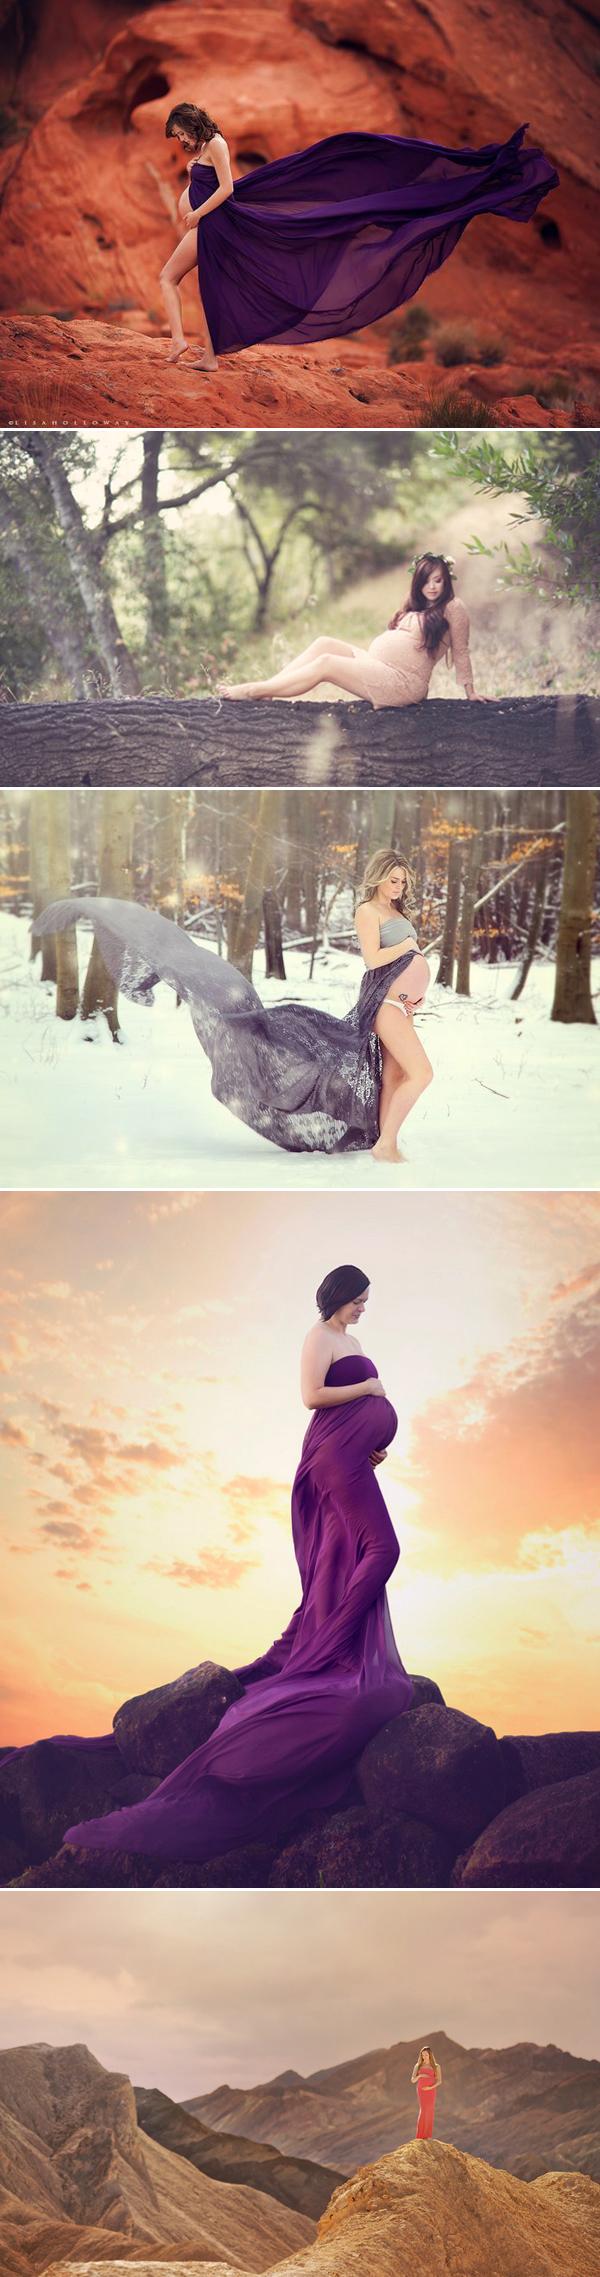 maternity02-adventure